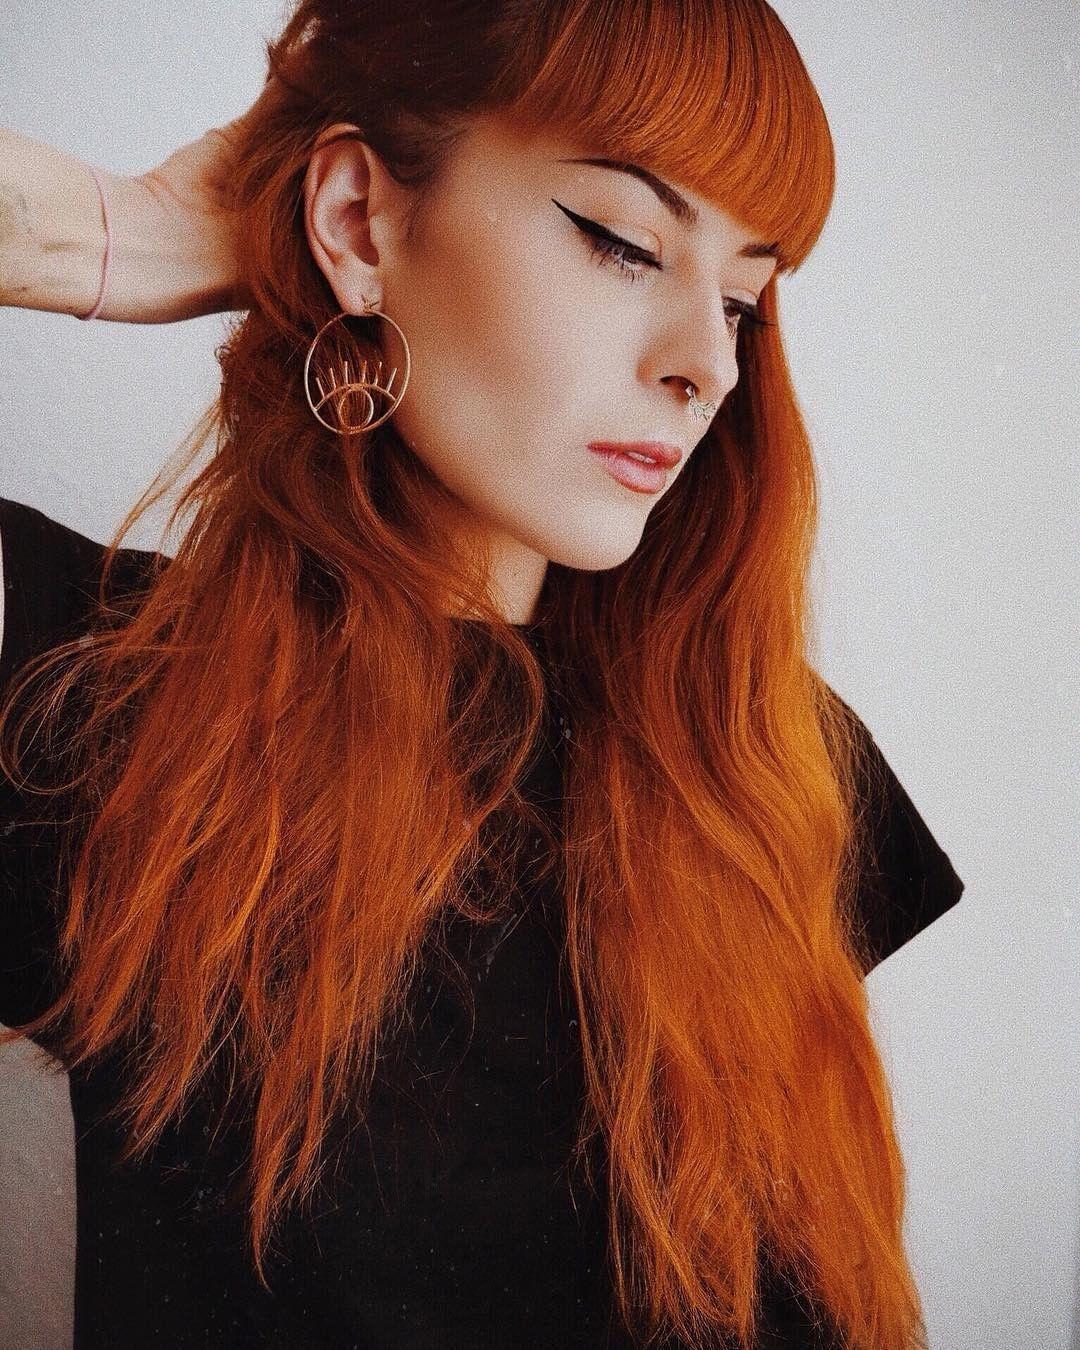 viorosie always give us redhead envy She uses Sunset Orange over ...